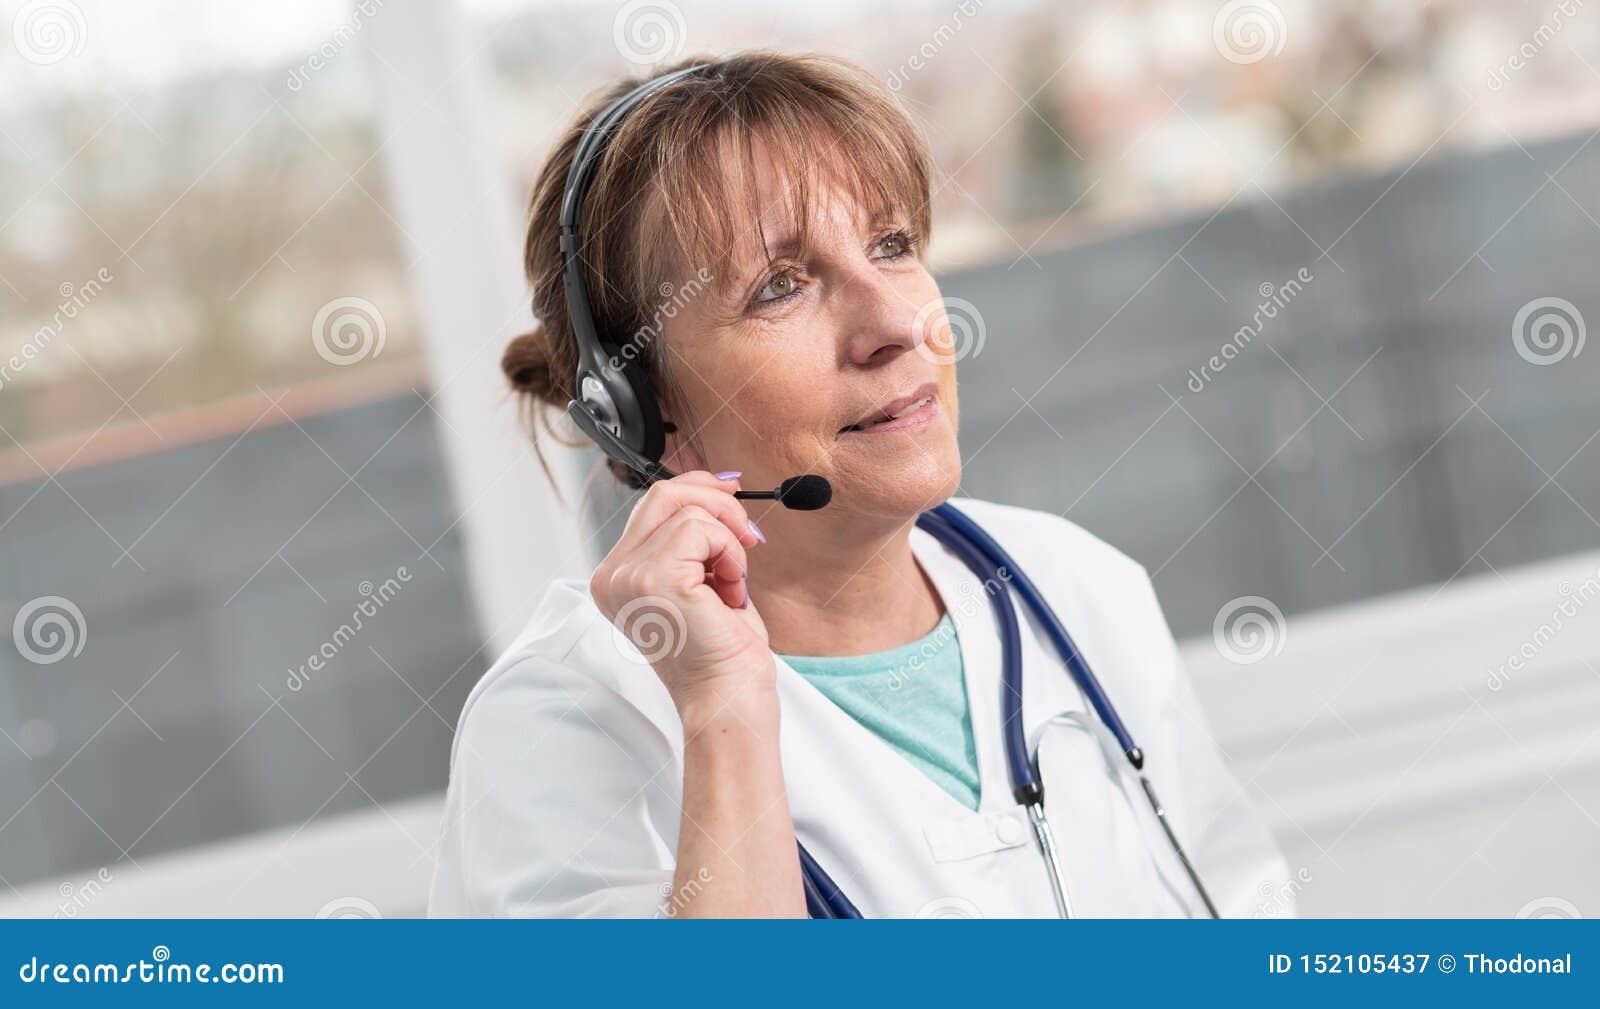 Portrait of female doctor during online medical consultation